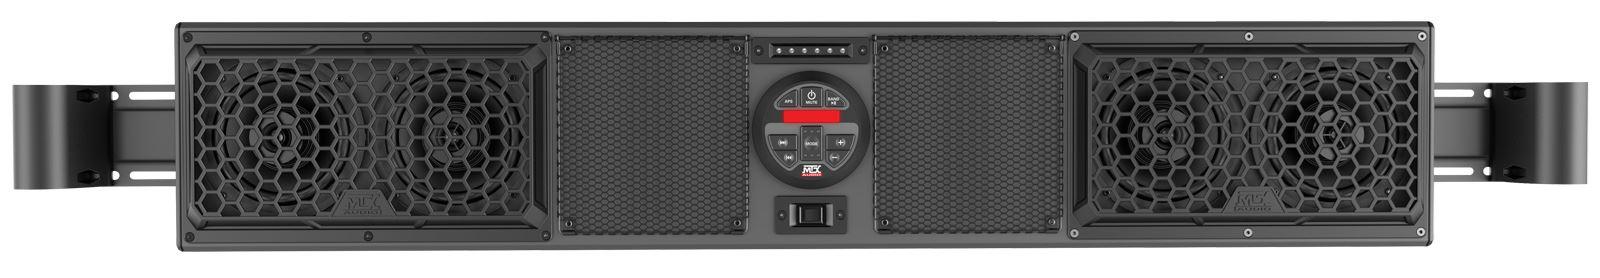 sound system for bar. mudsys46 overhead bluetooth utv sound bar front system for